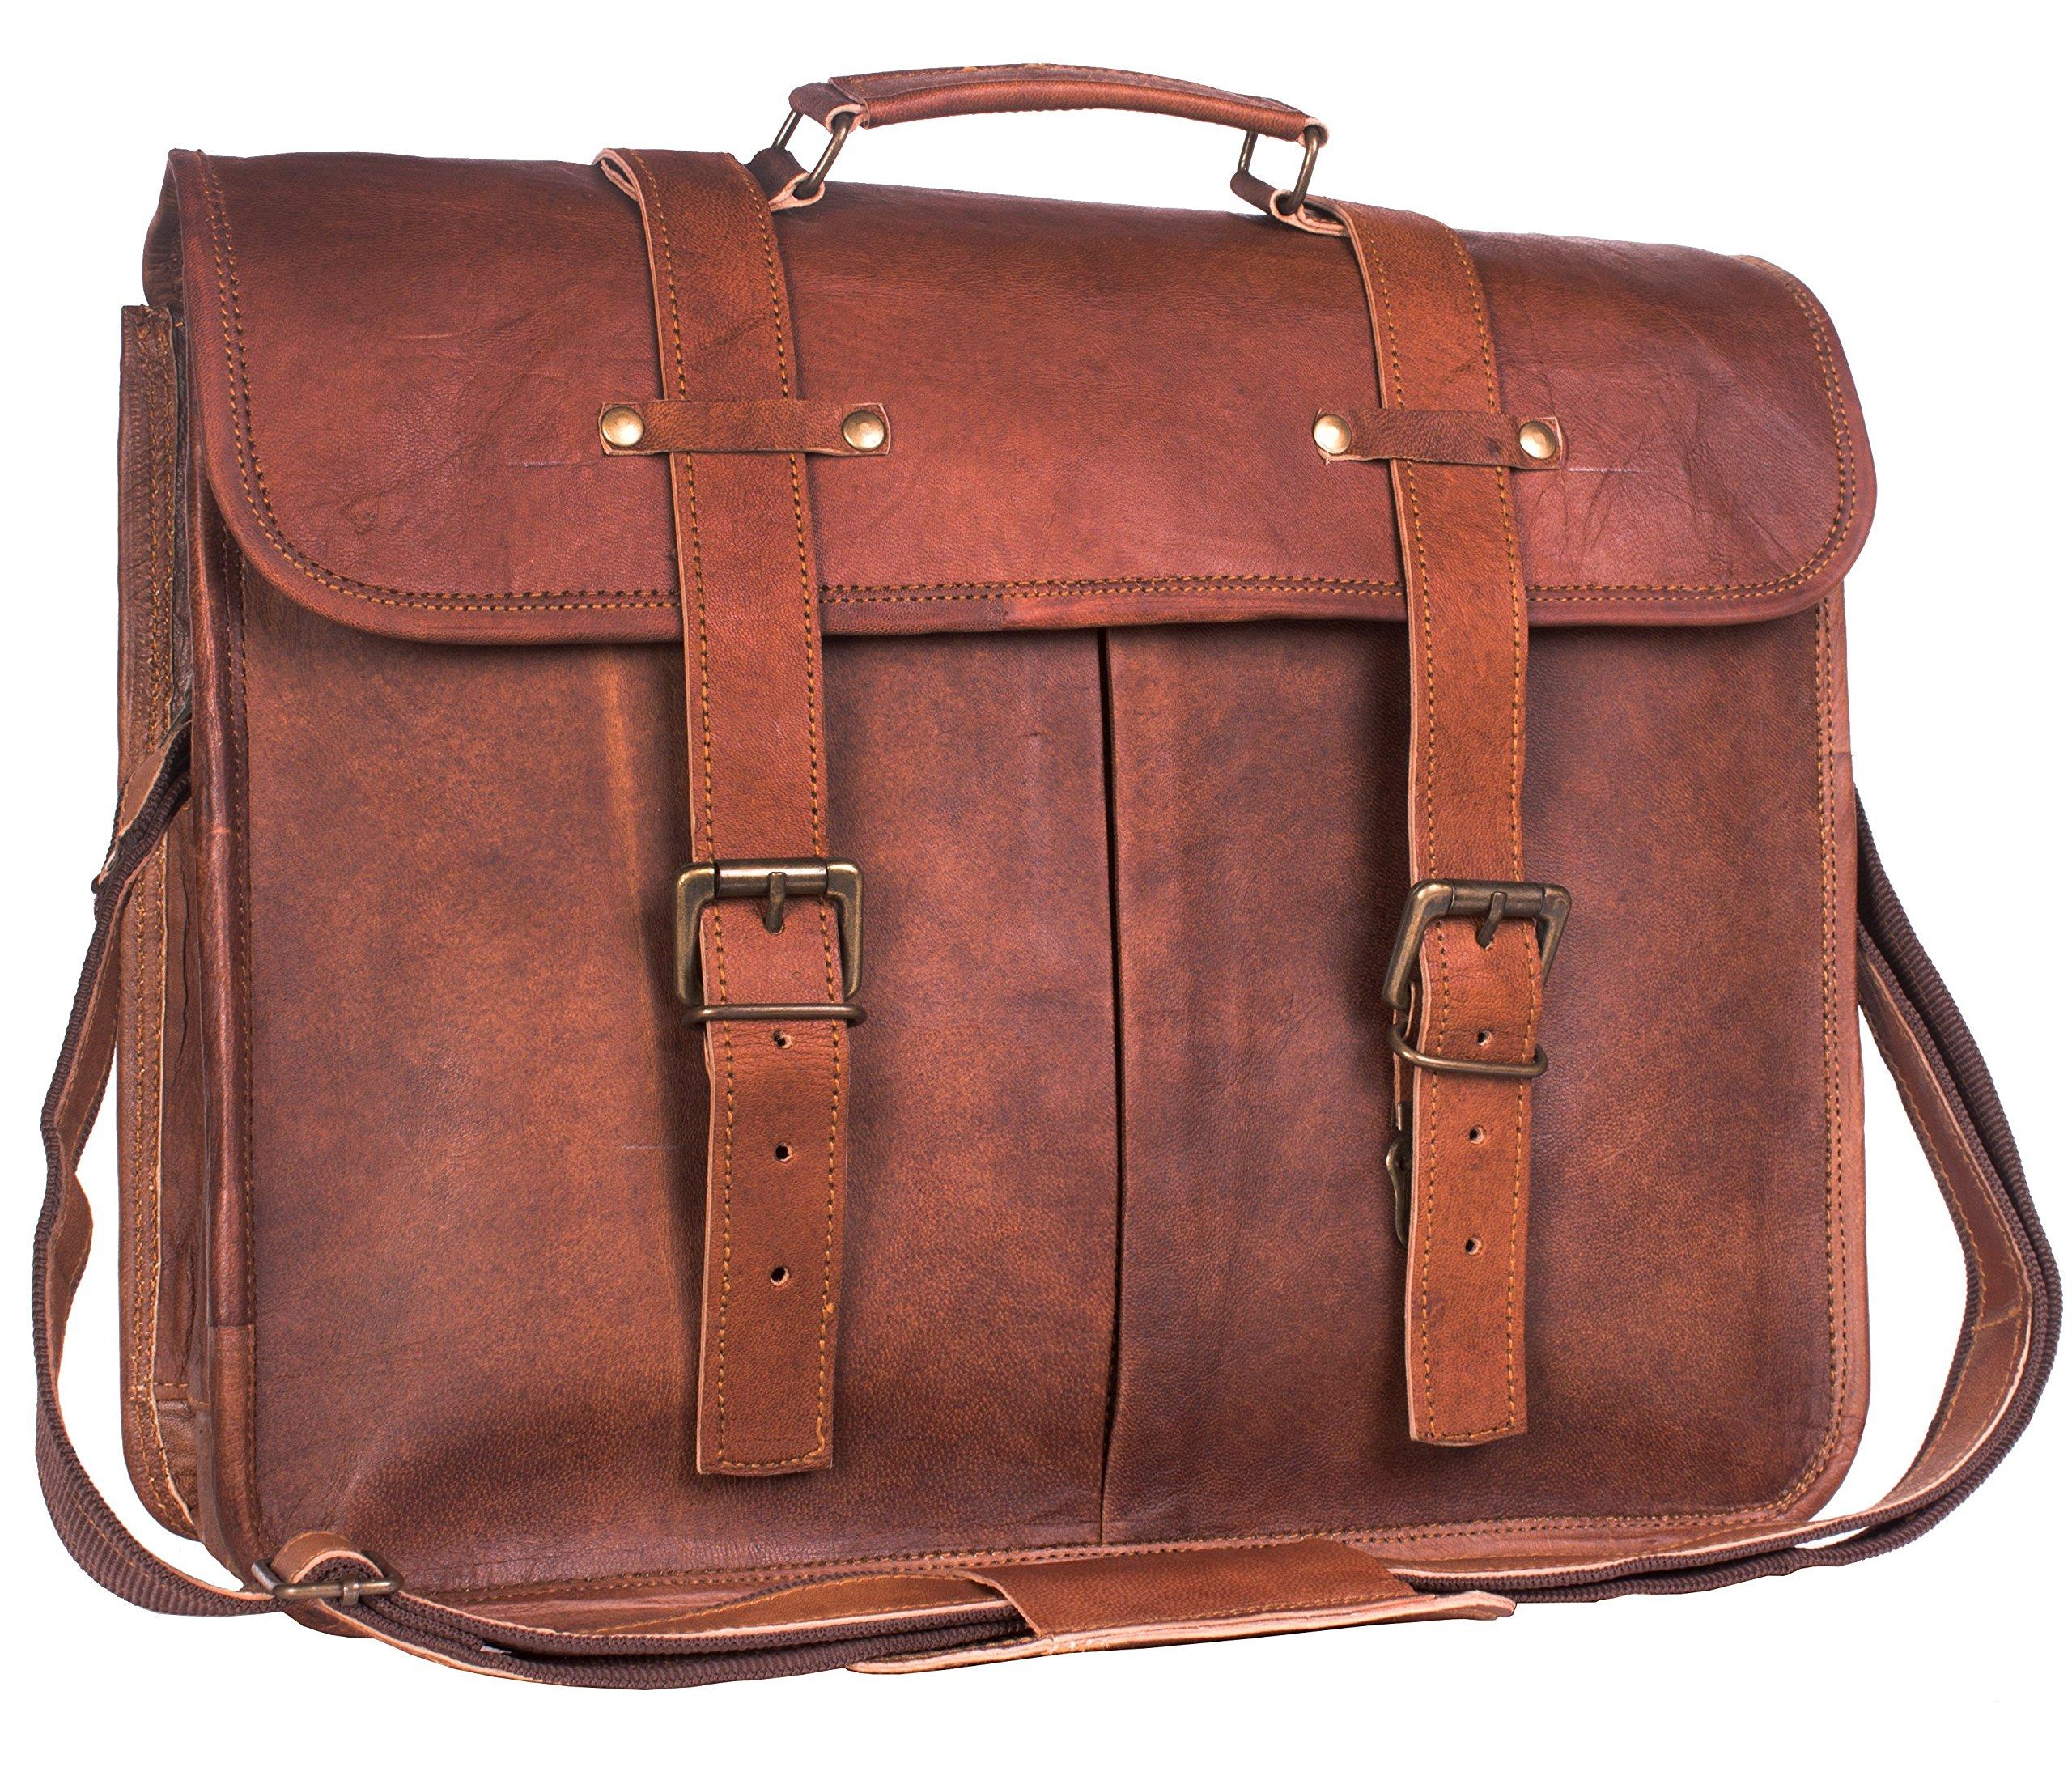 Jodhpuria Leather Satchel Bag for Men - 15.5 Inch Mens Leather Laptop Messenger Briefcase Bags - Genuine Leather